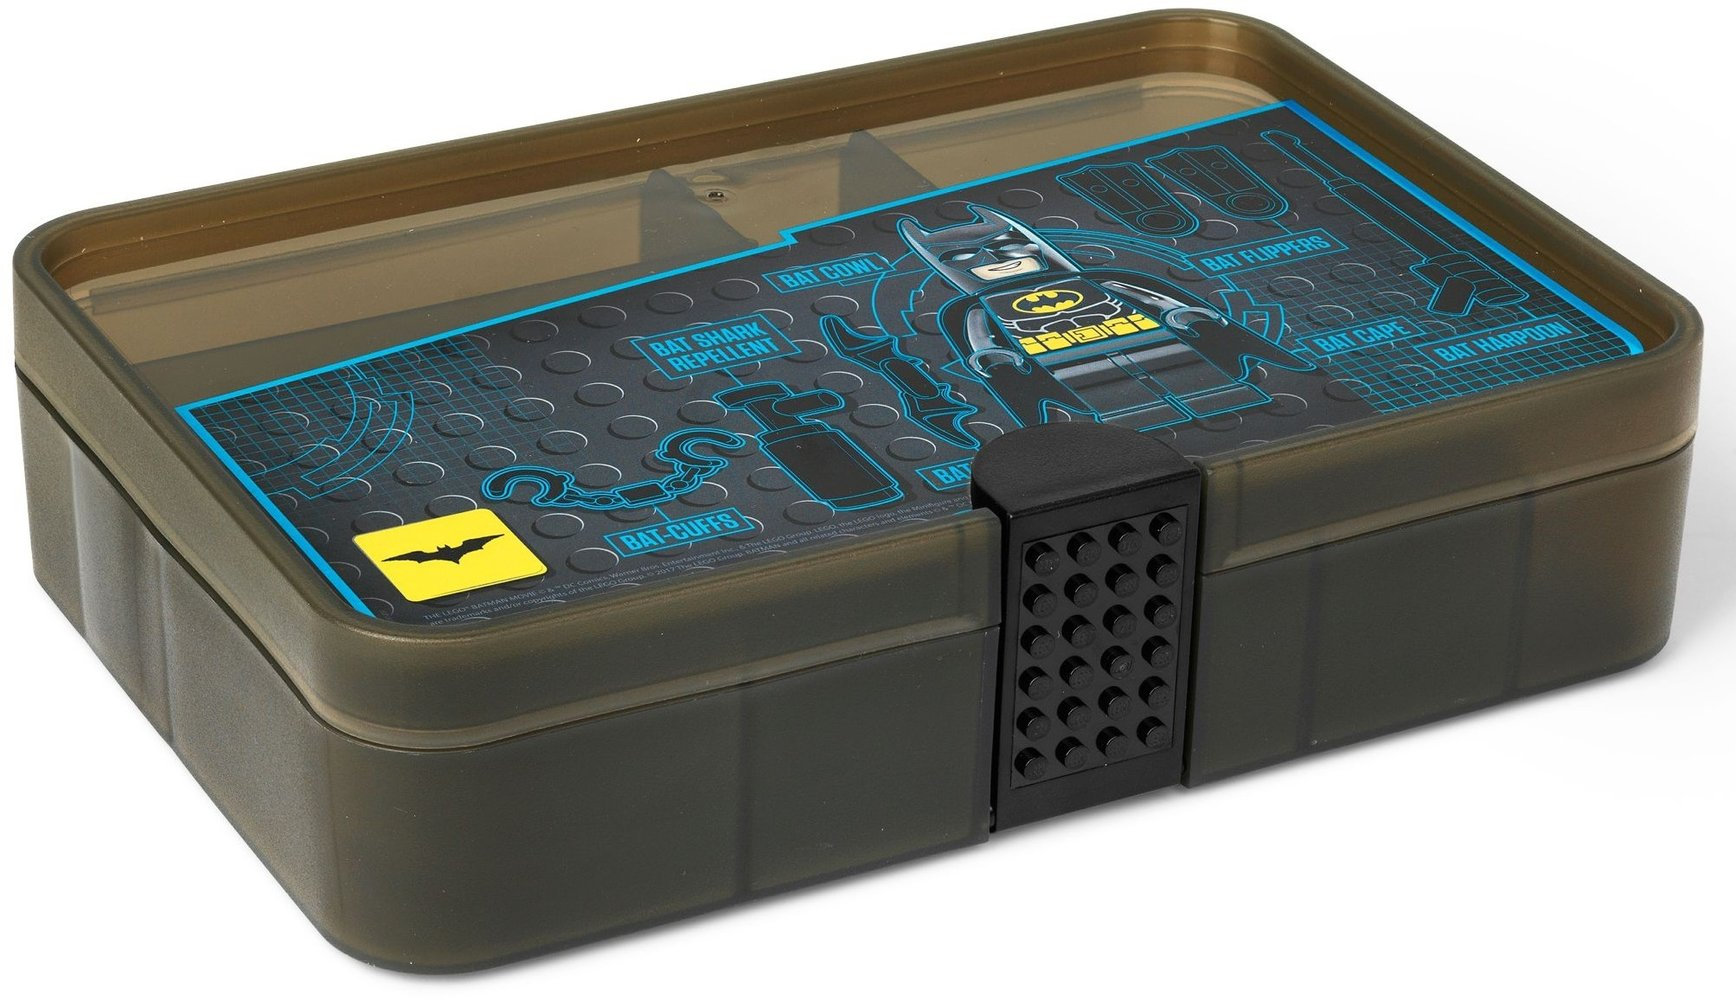 The LEGO Batman Movie Collector Box